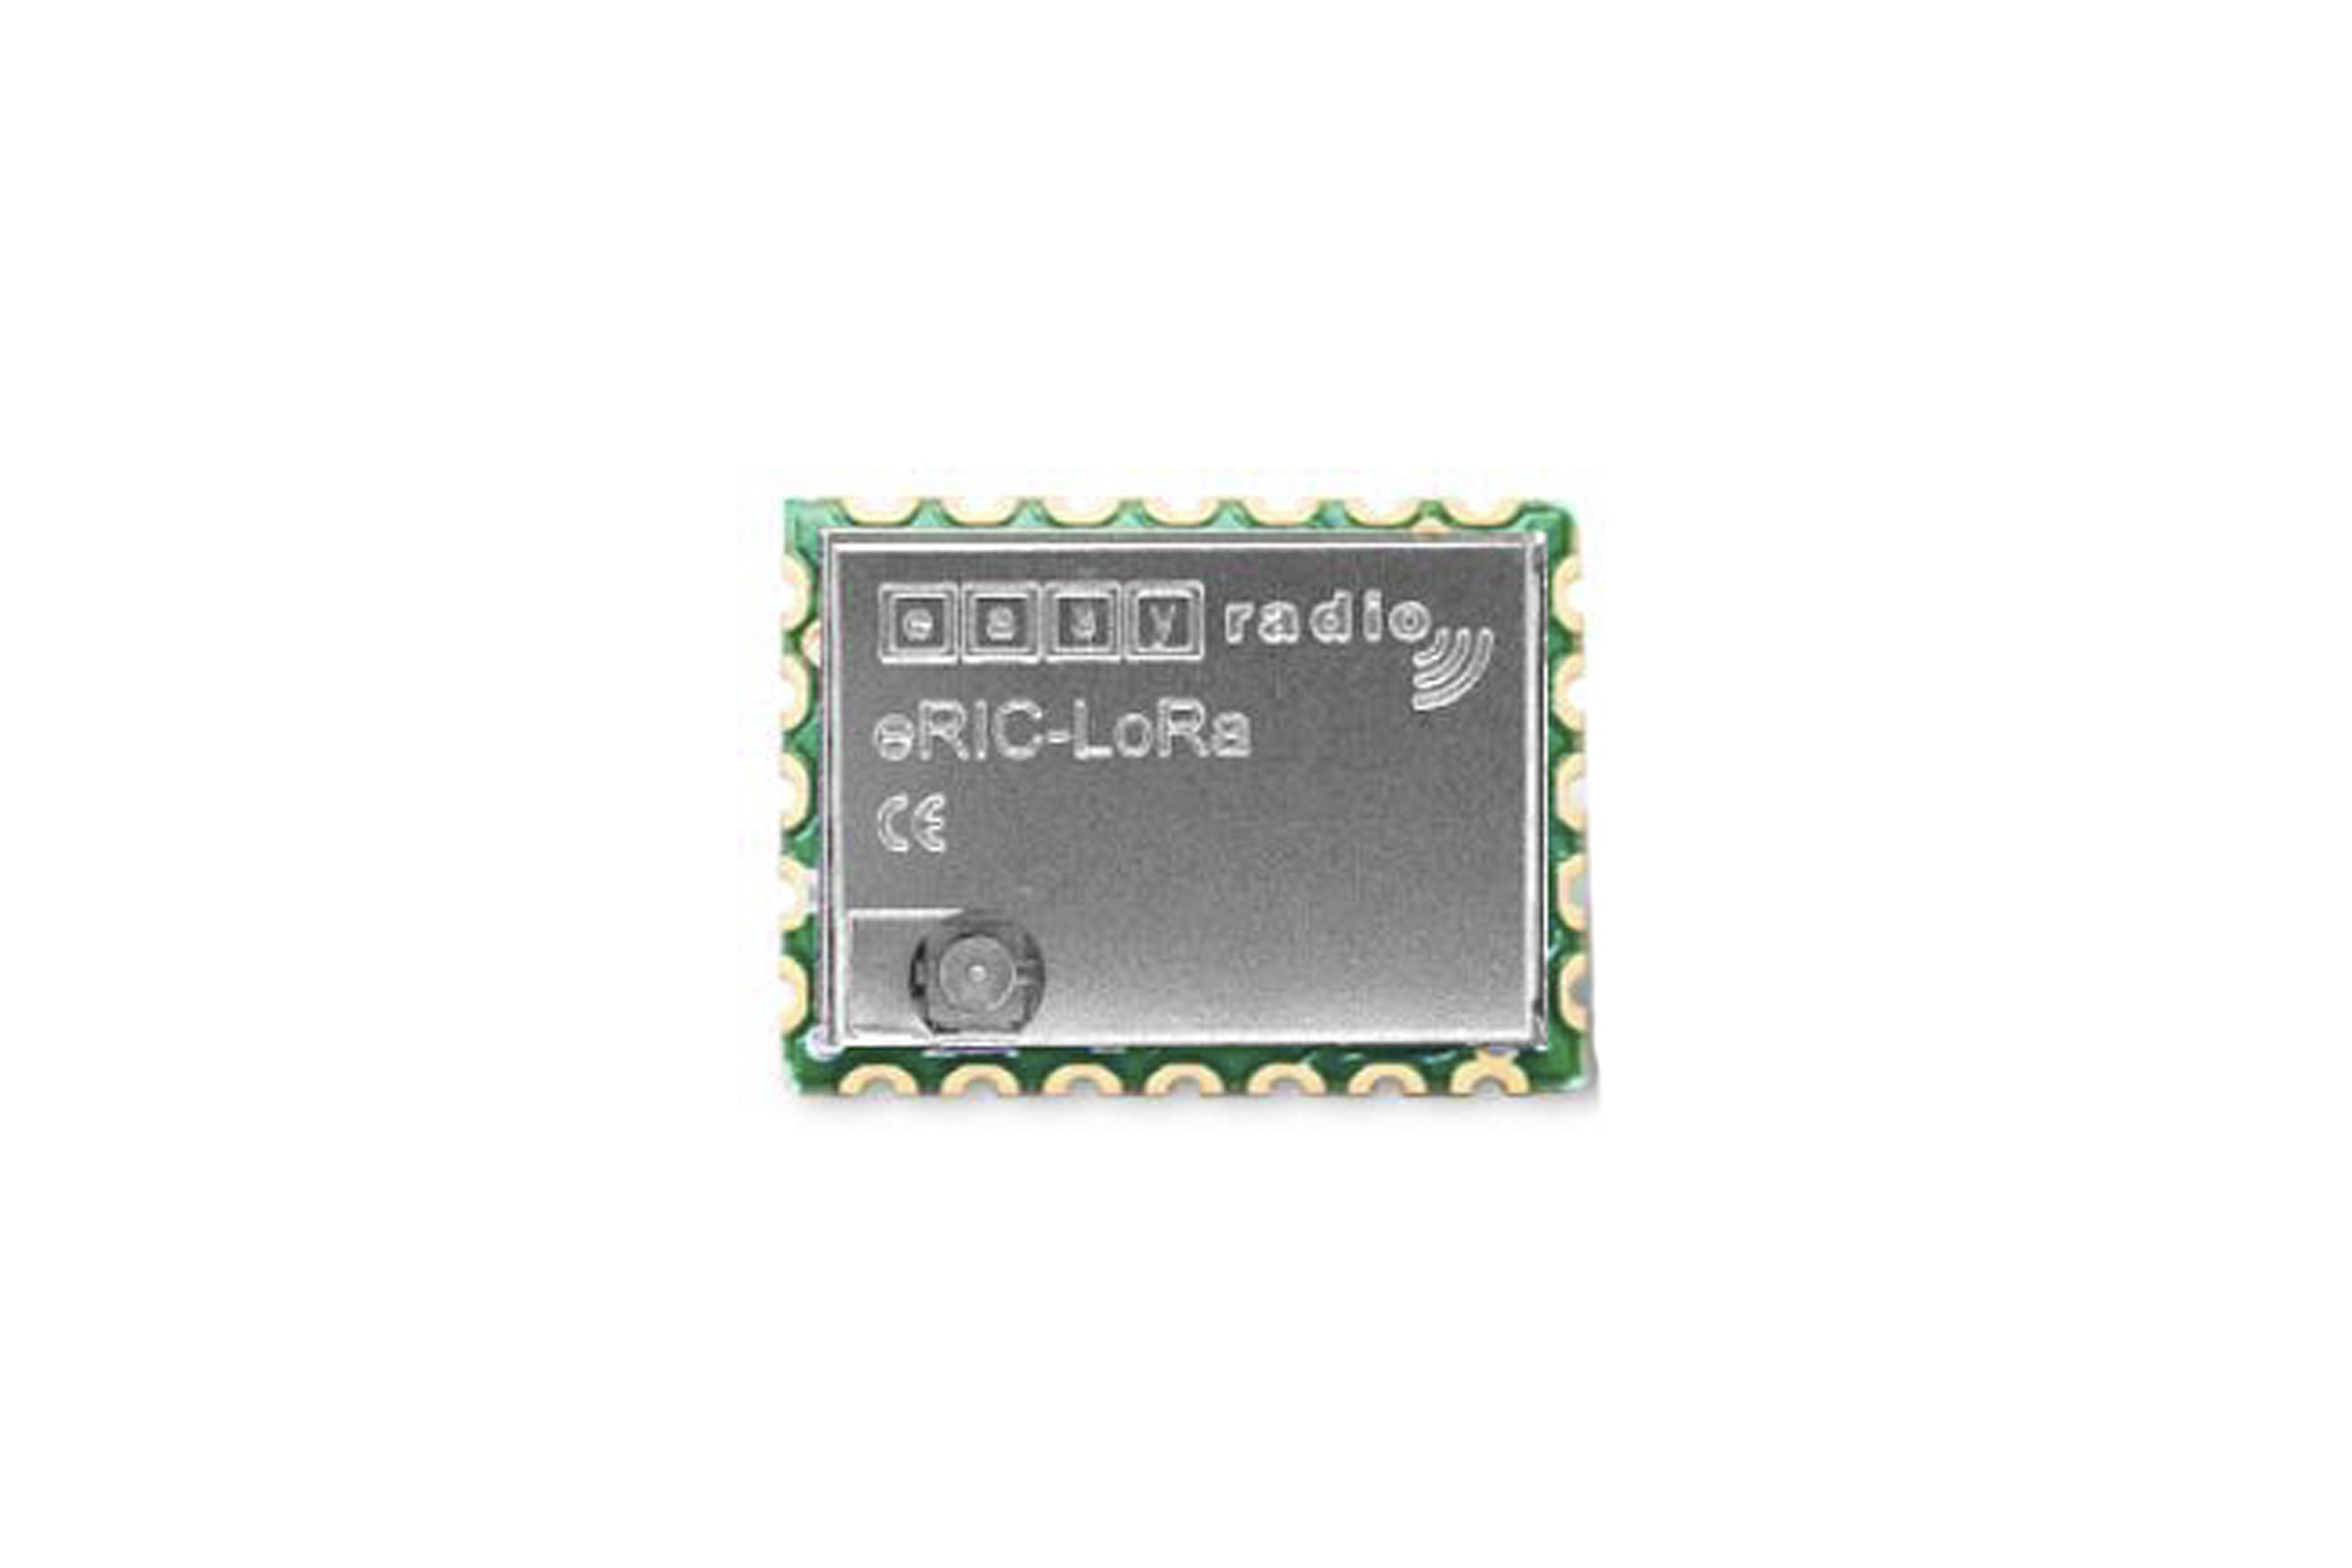 Modulo ricetrasmettitoreeRIC-LoRa LoRa 868MHz